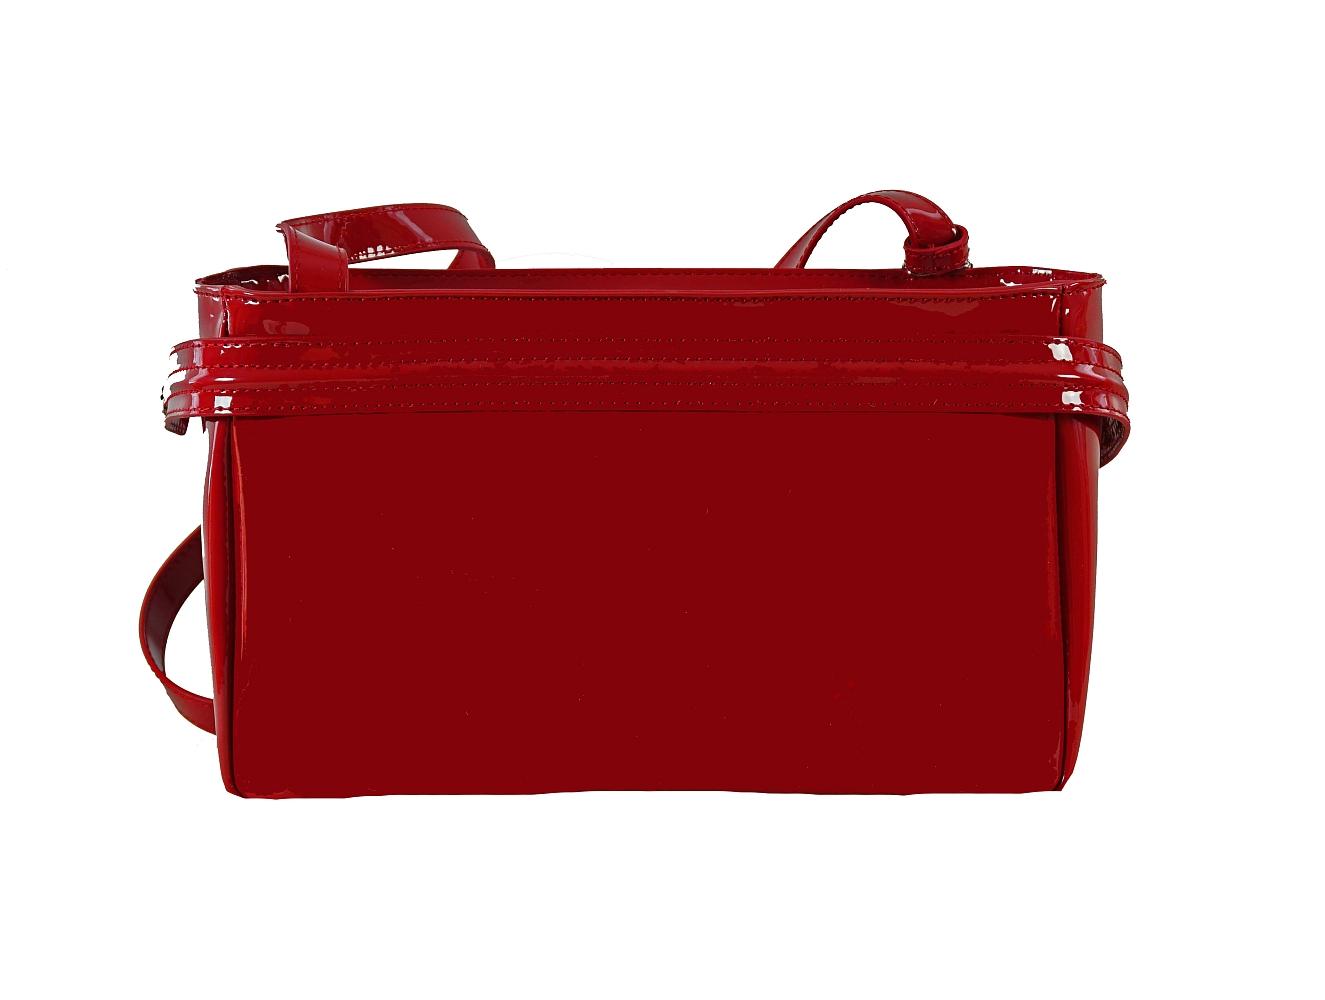 Armani Jeans Tasche Handtasche f. Damen 922527 CC855 00176 bordeaux HW16